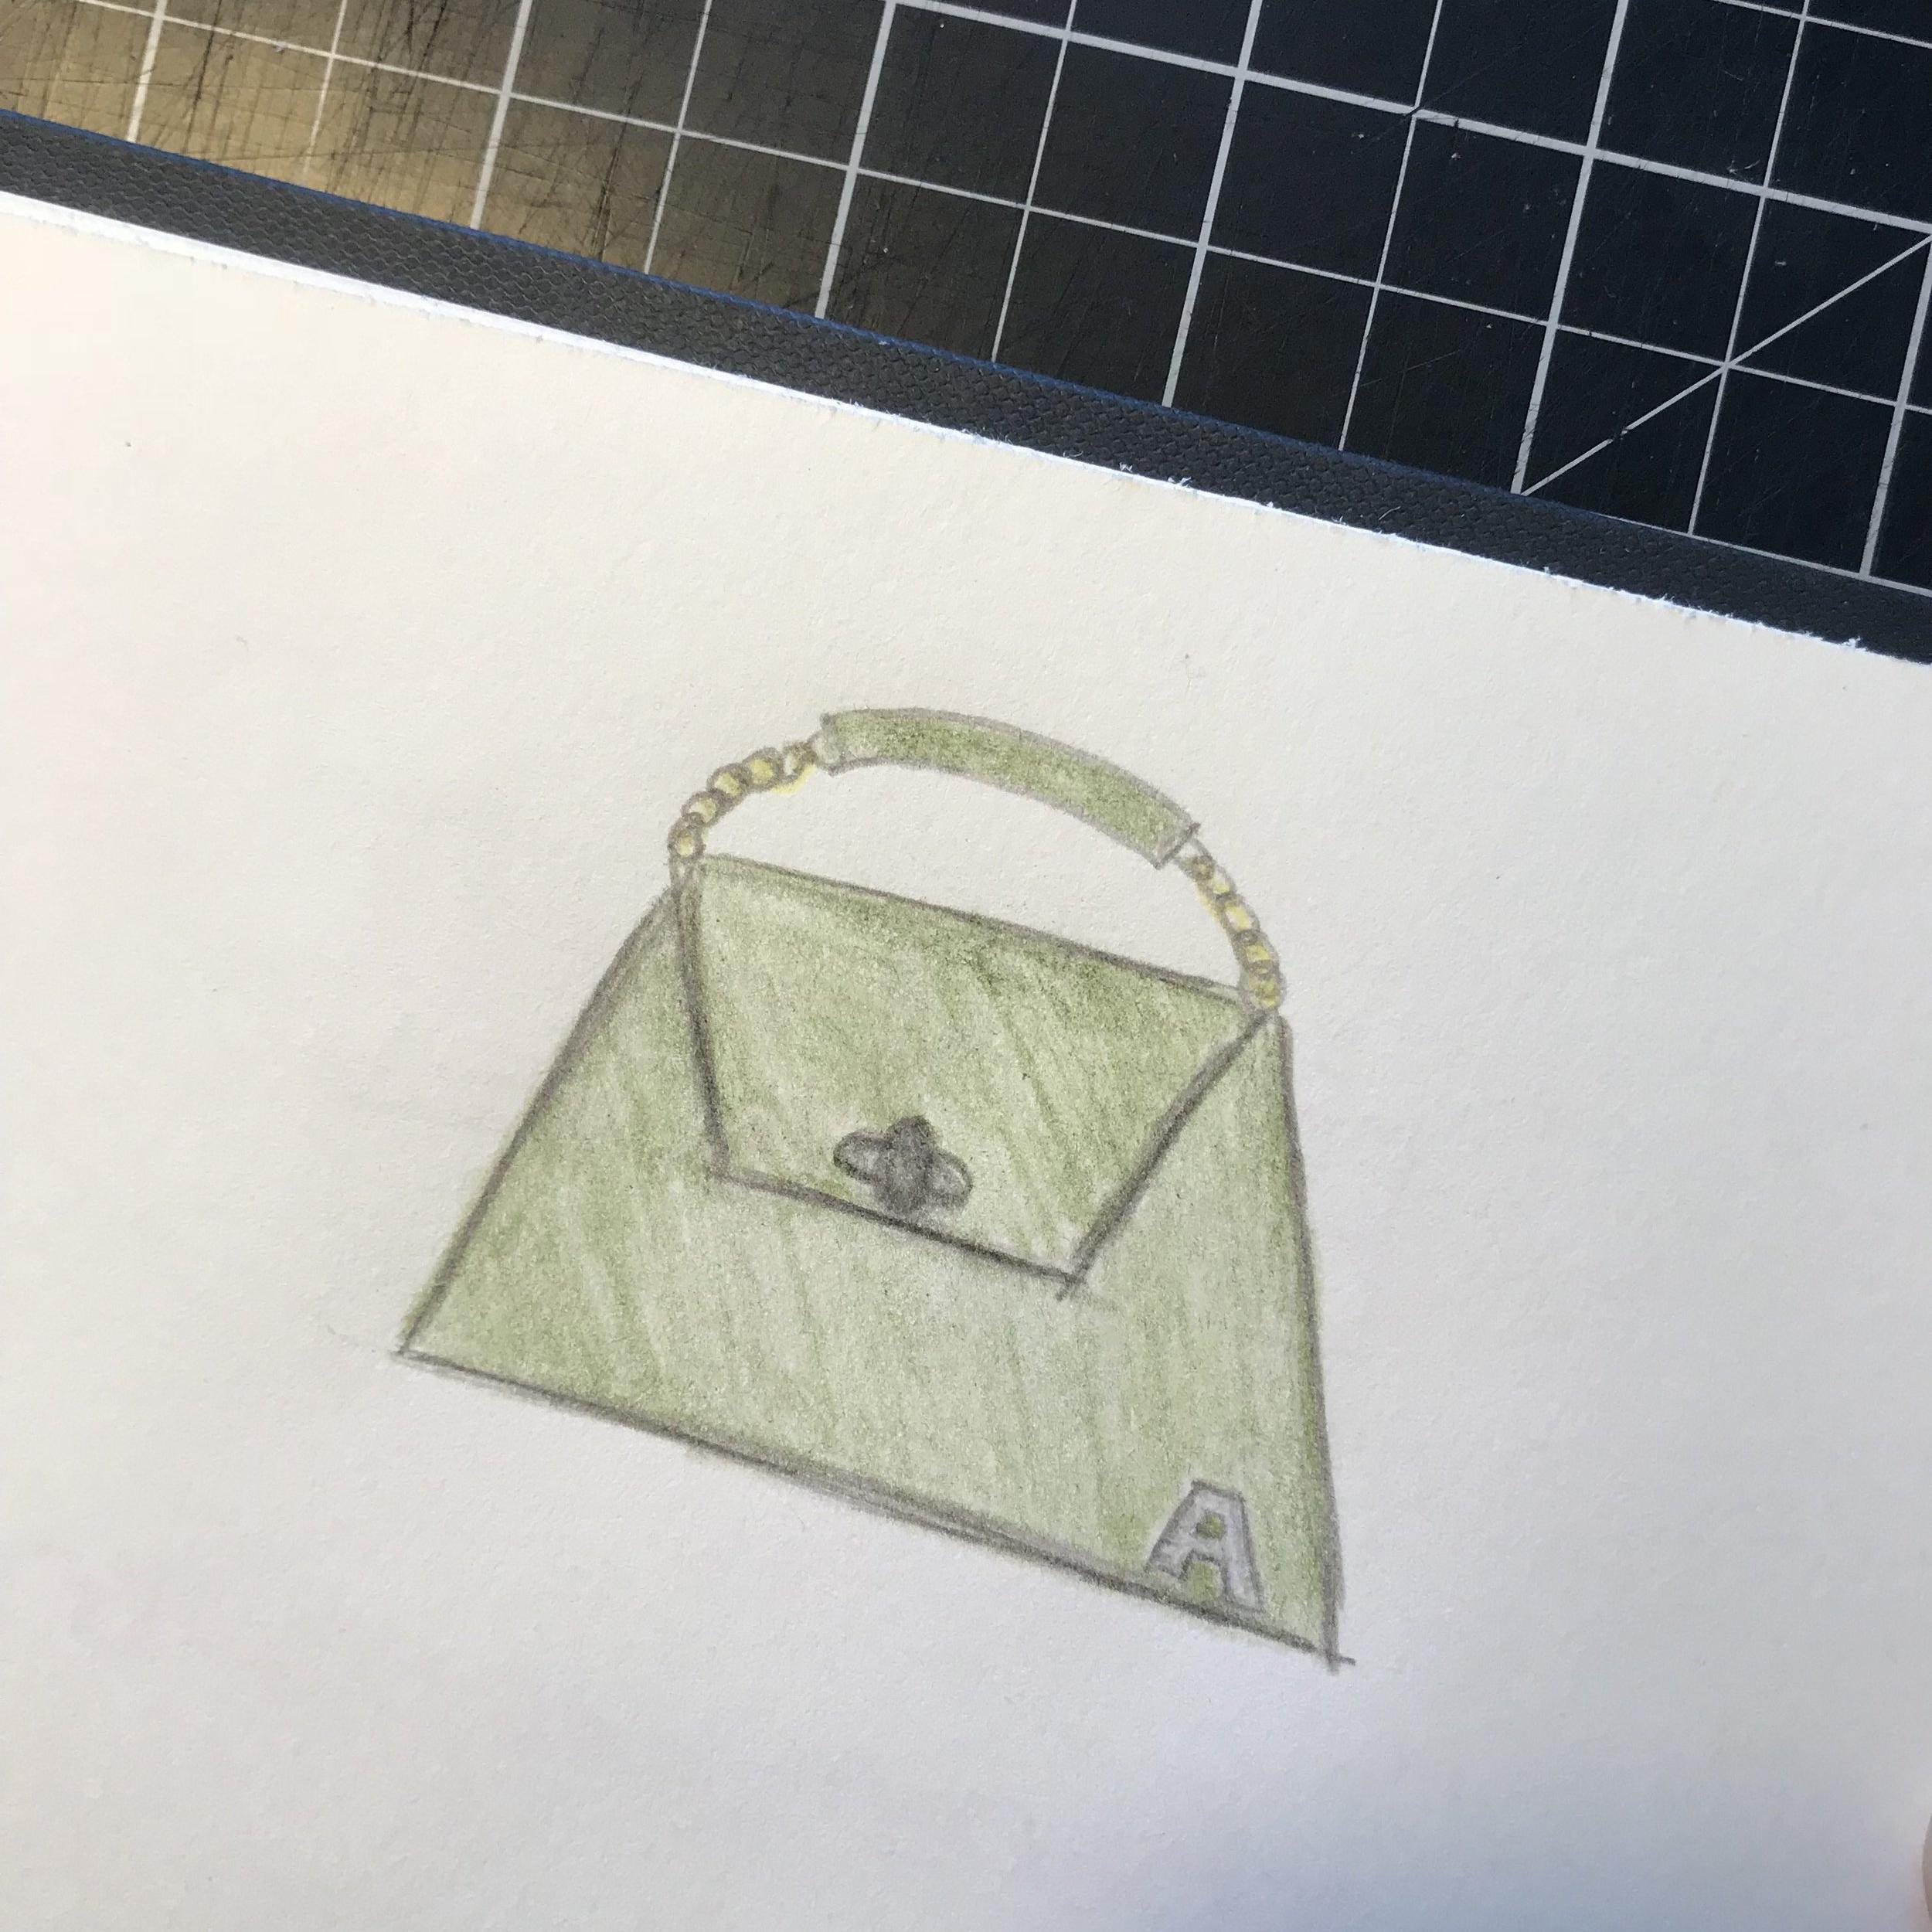 Sketch of a handbag design idea I had